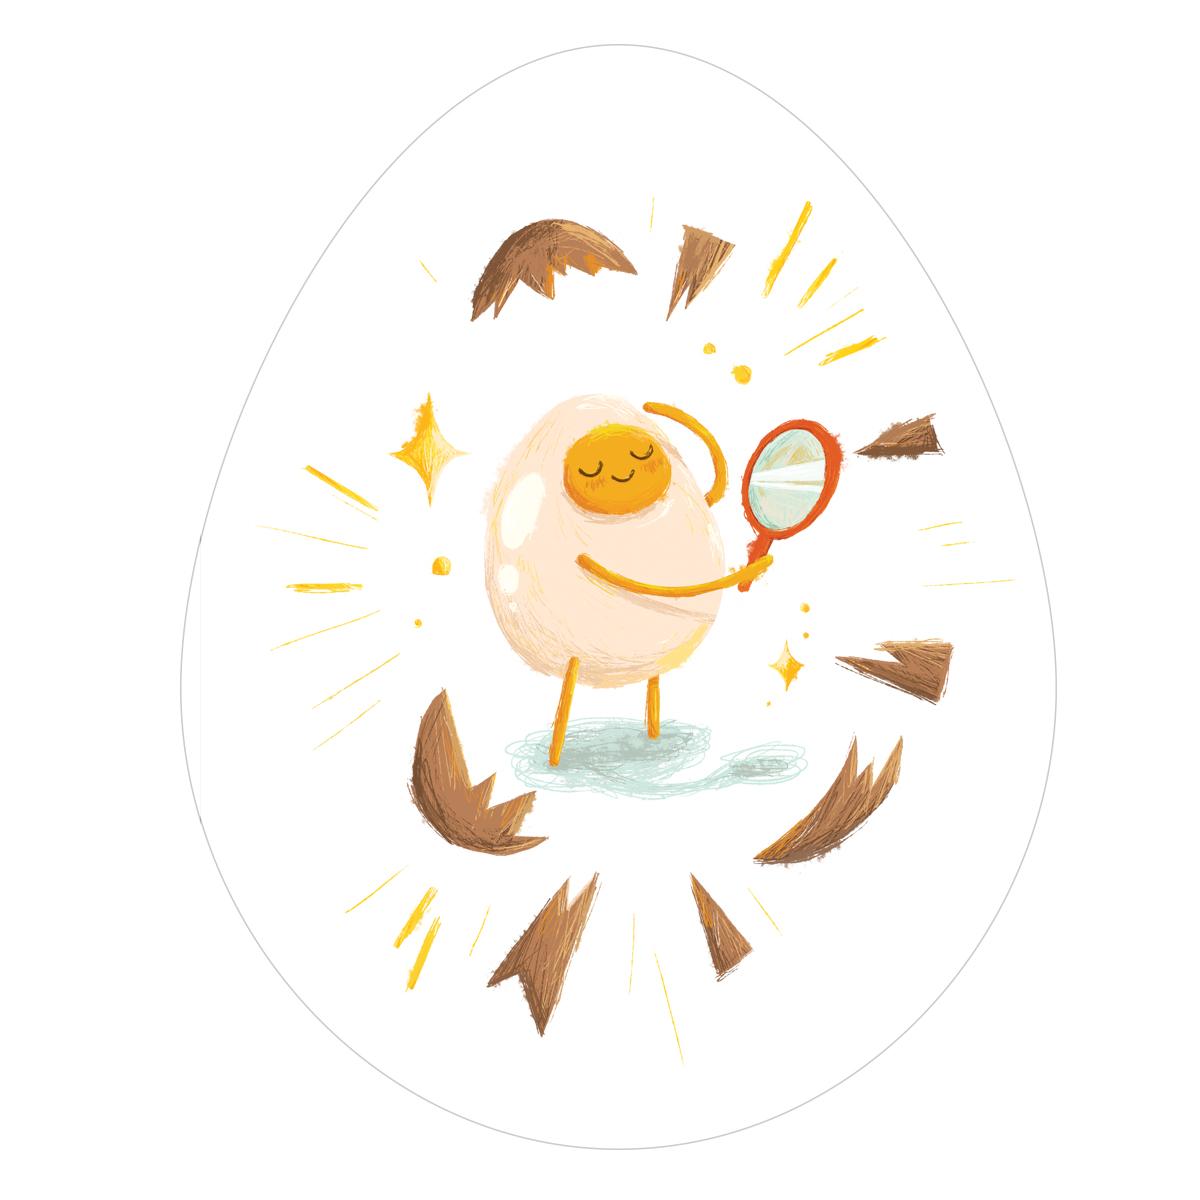 Eggfographic_forweb7.jpg